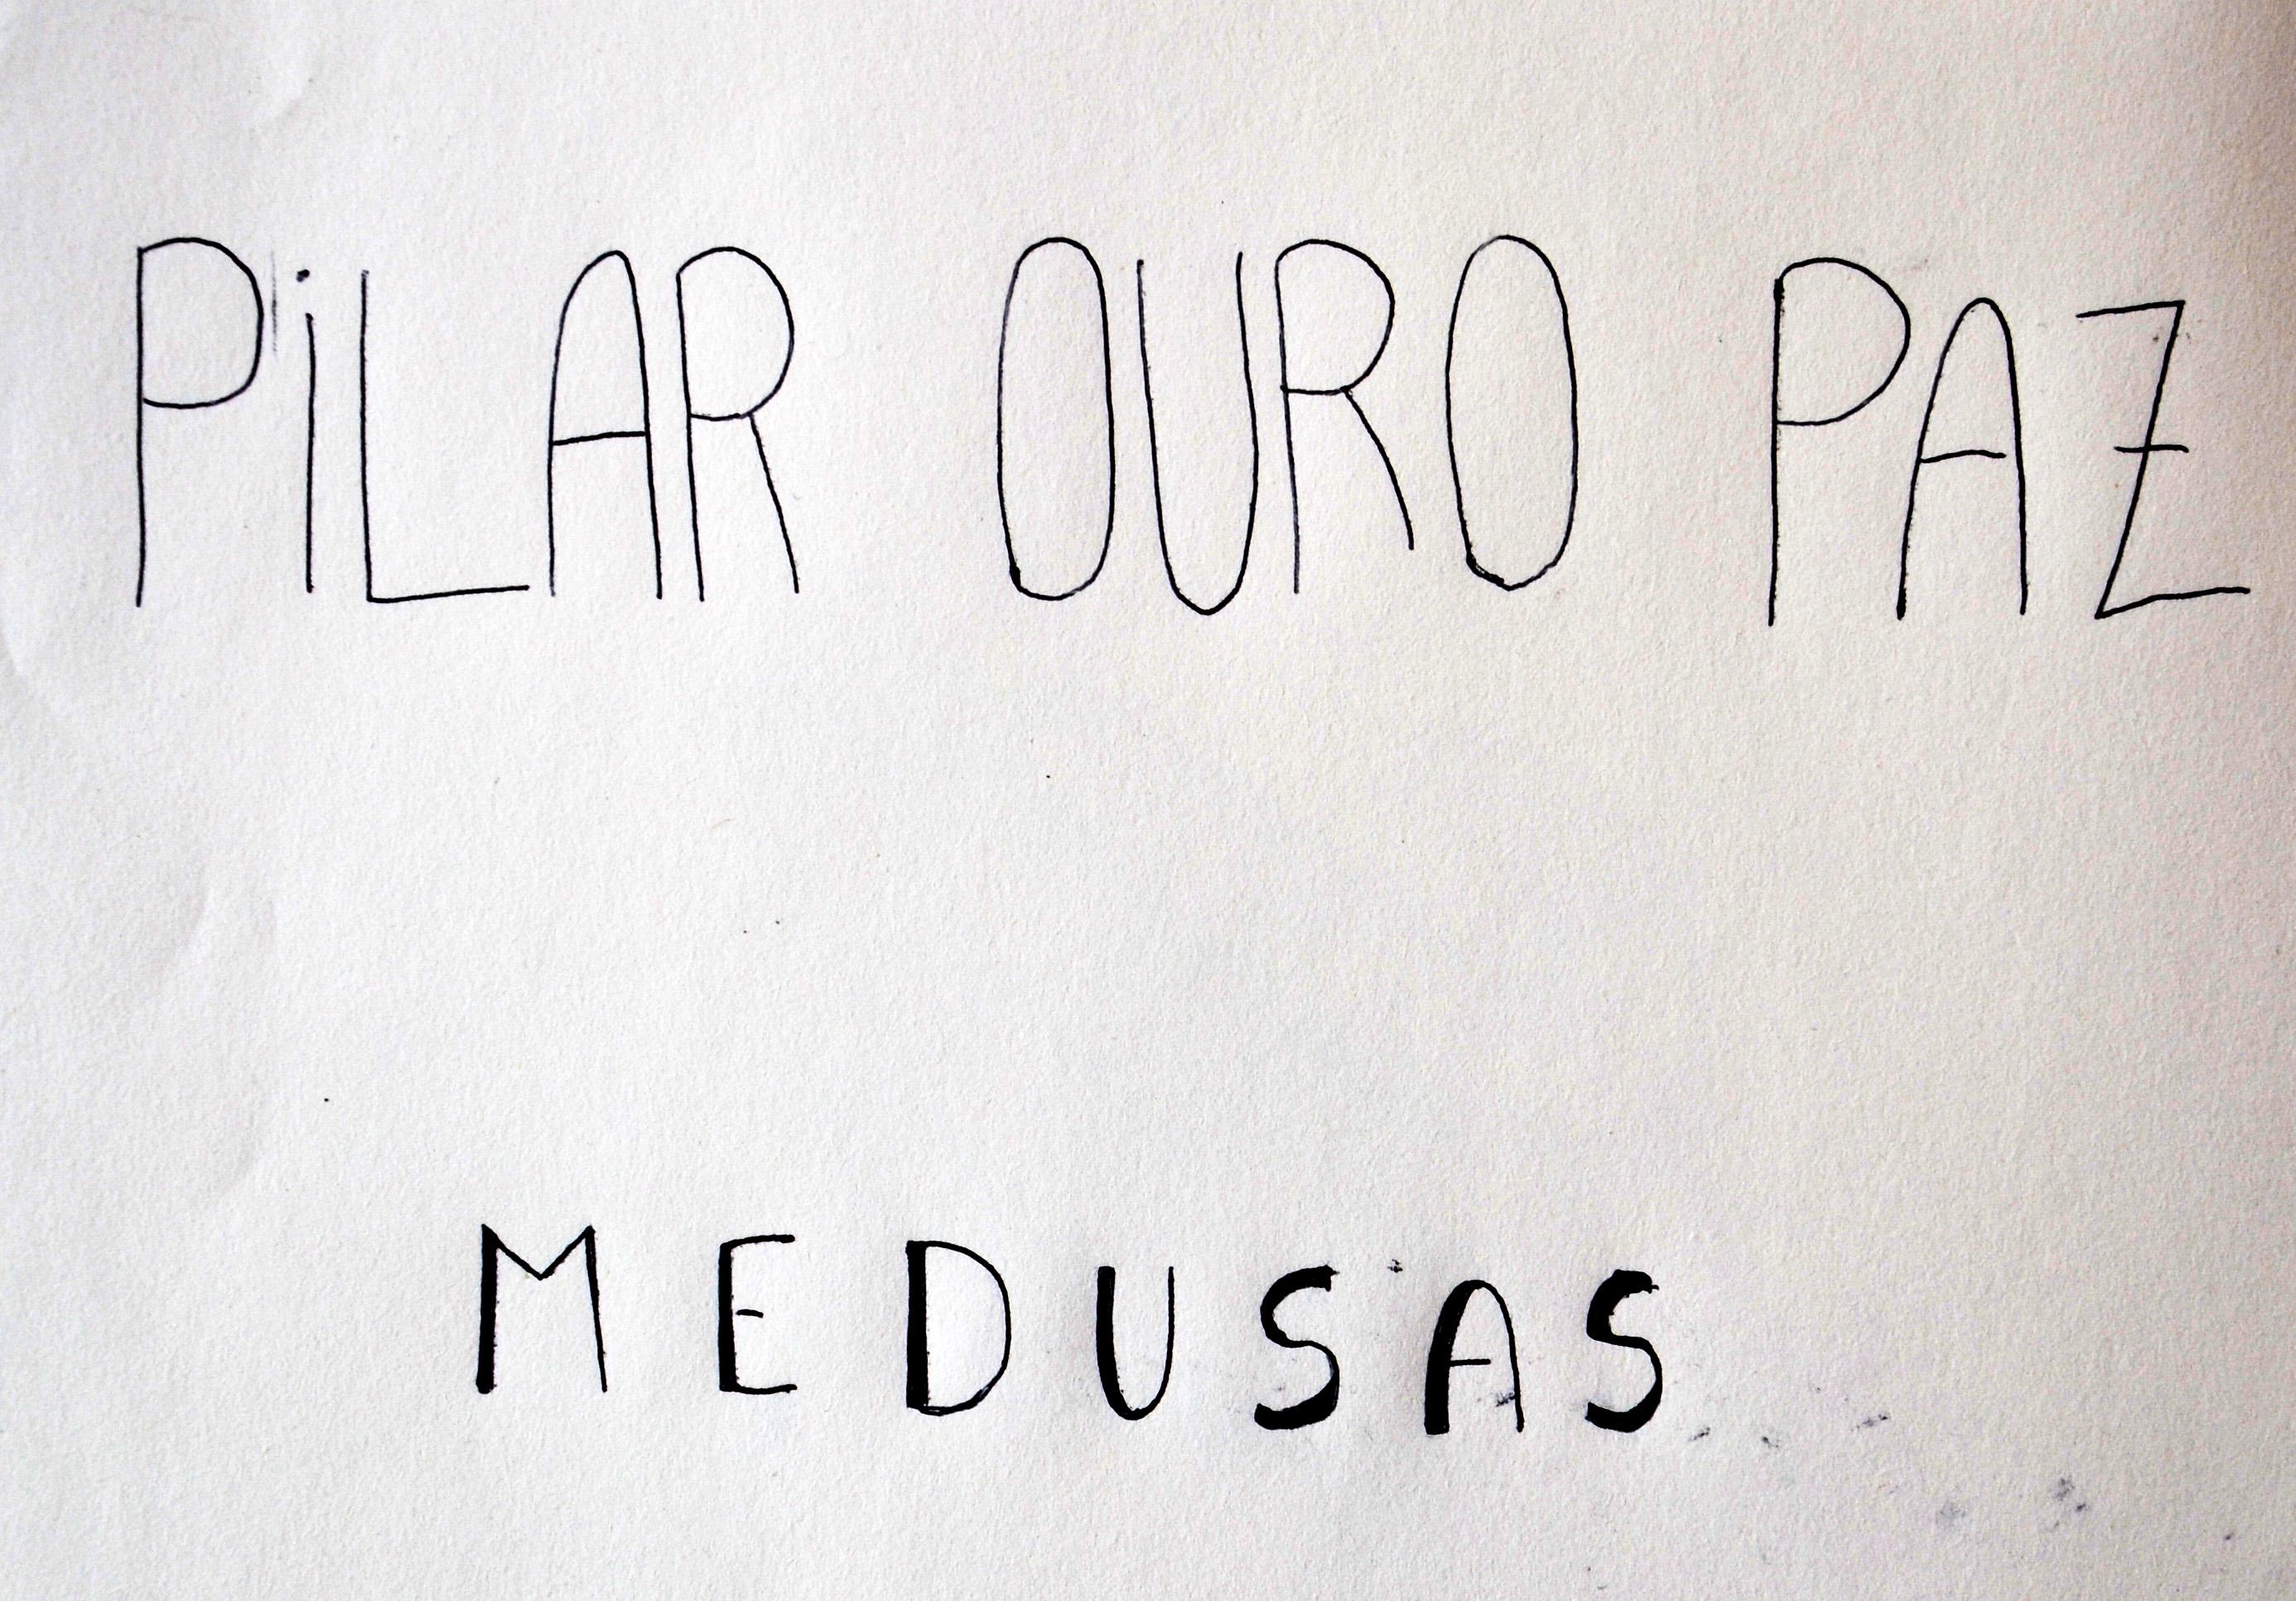 Pilar Ouro Paz Signature